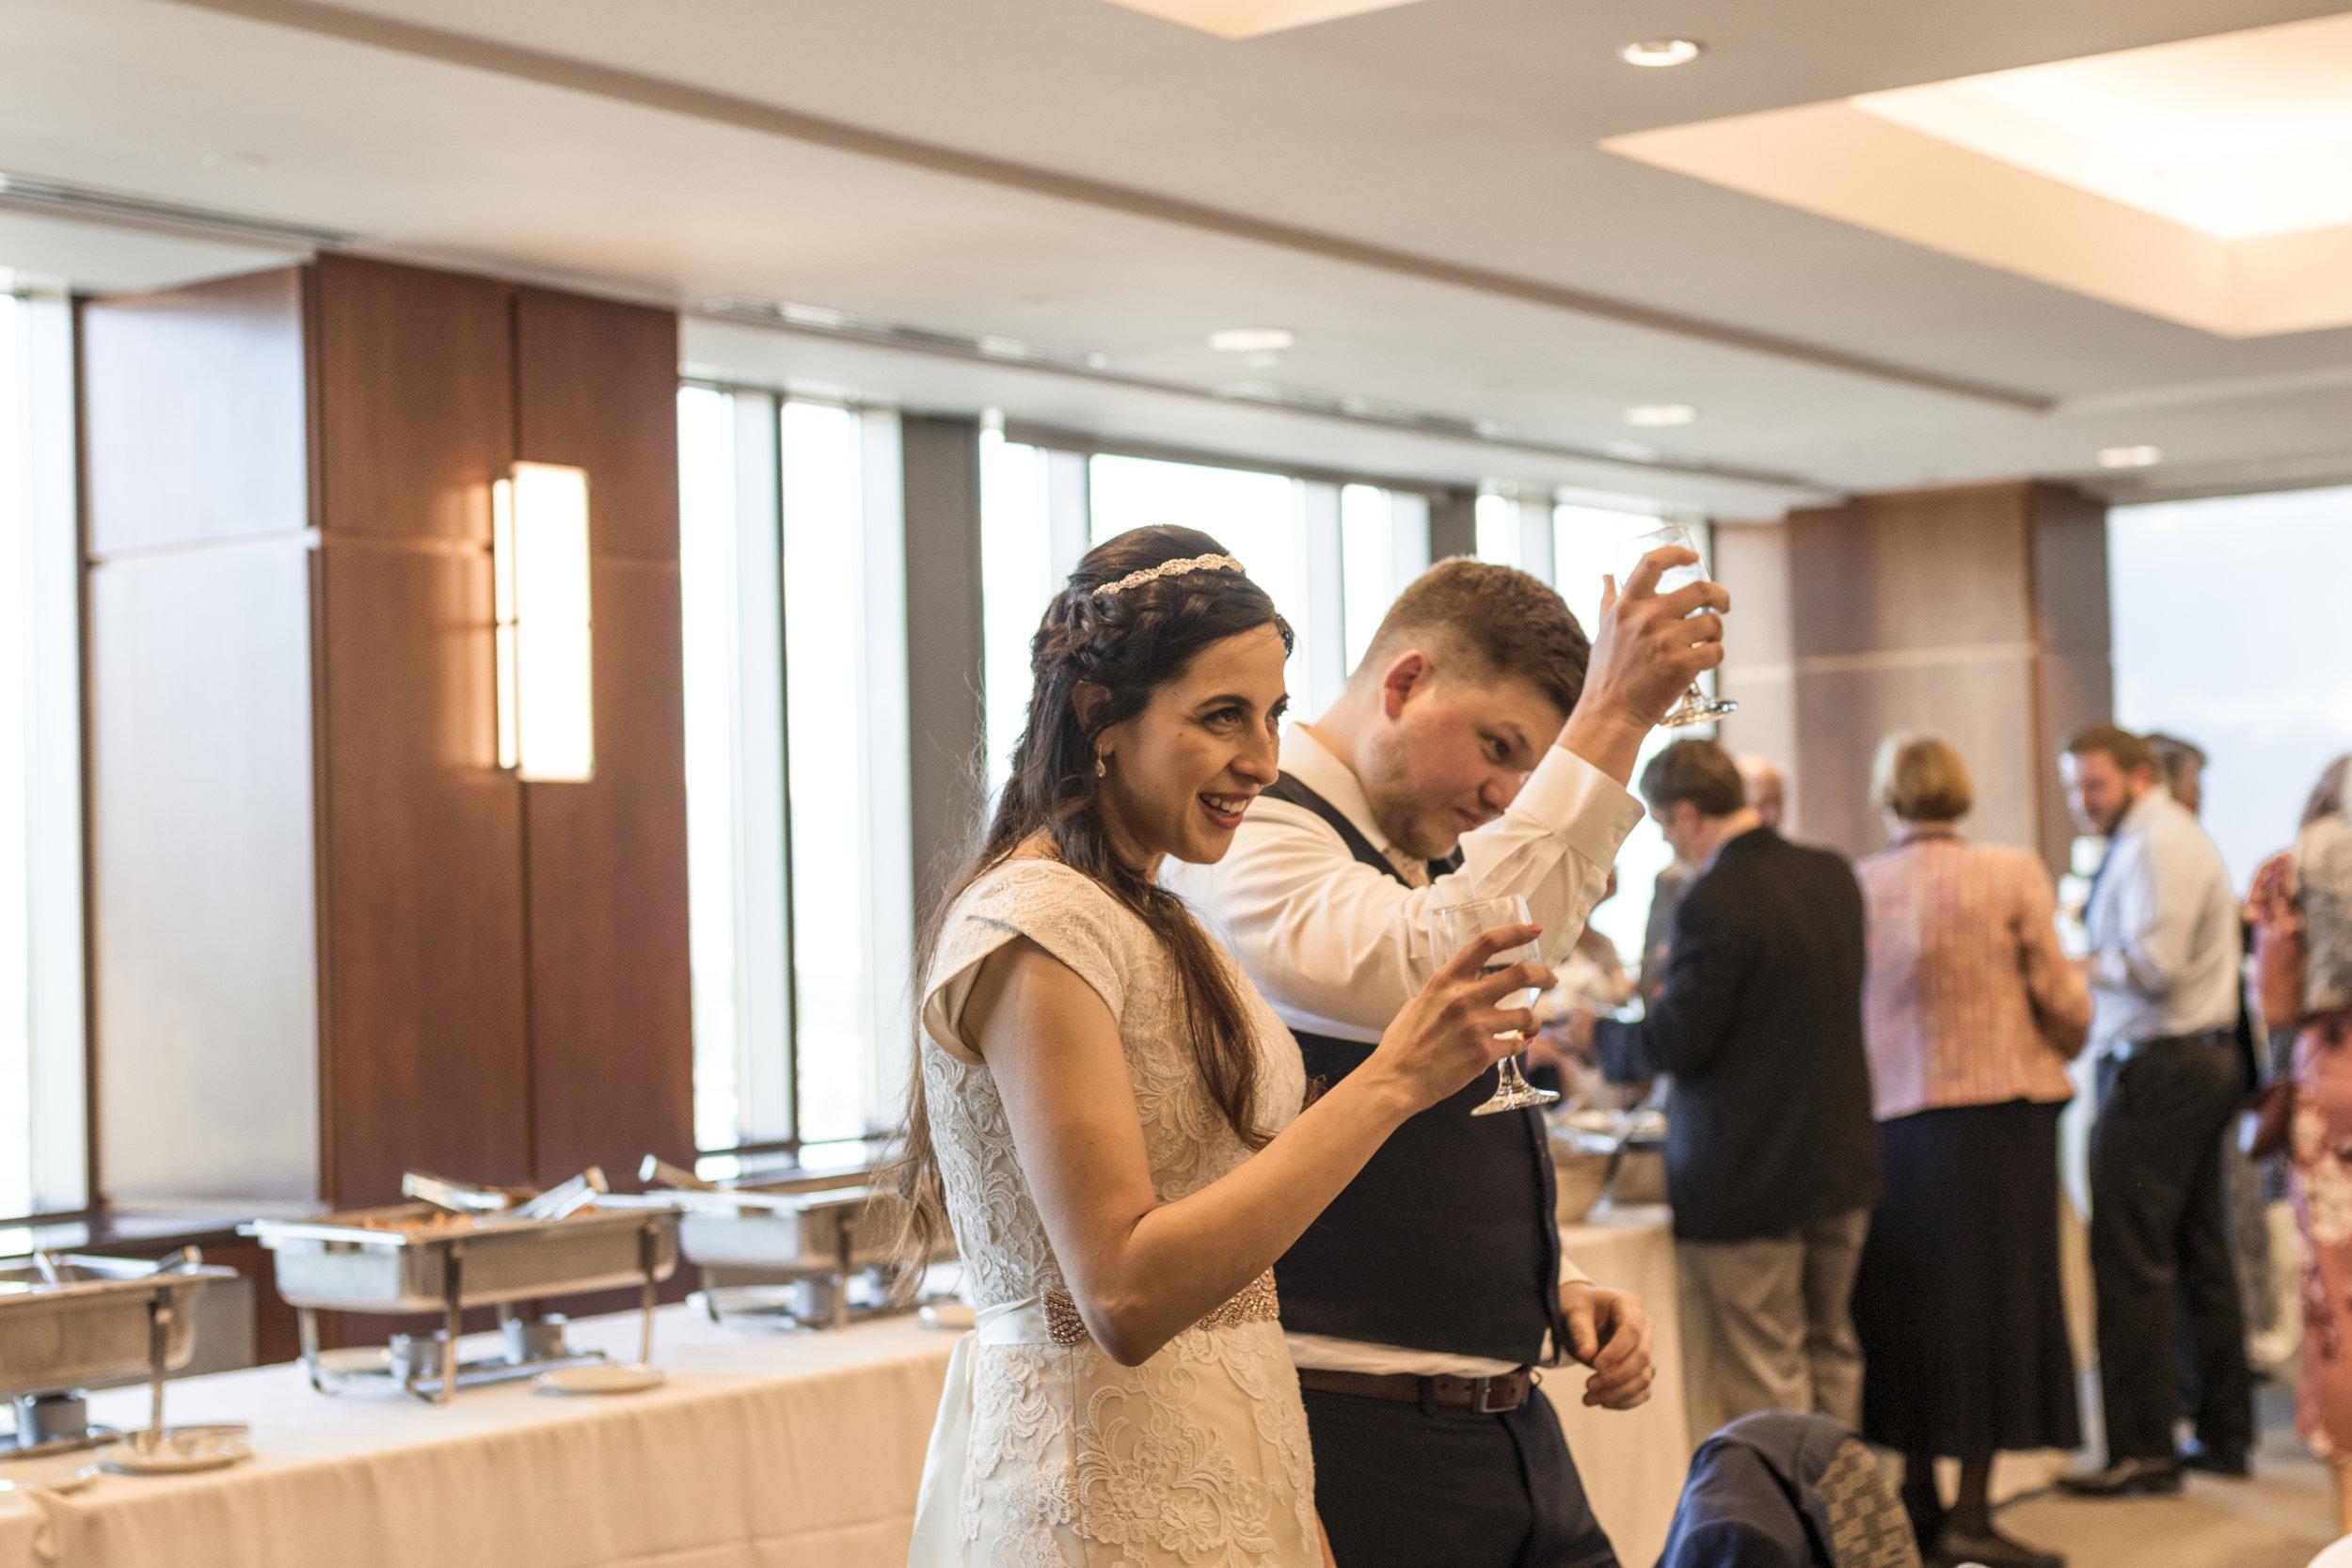 Utah Spring Wedding Reception in the Zions Bank Founders Room by Bri Bergman Photography10.JPG